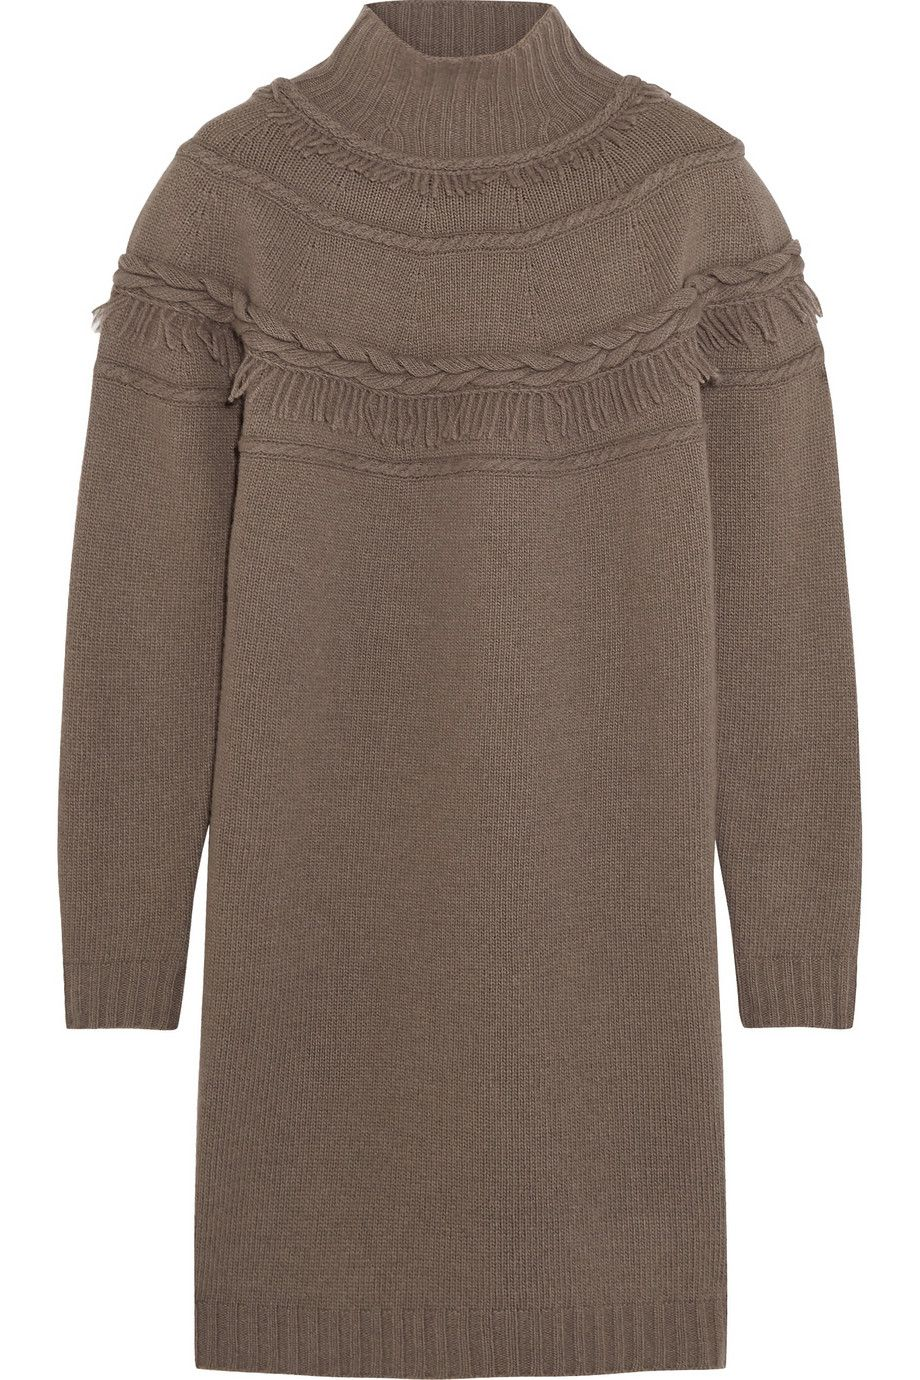 Agnona - Fringed wool and cashmere-blend mini sweater dress